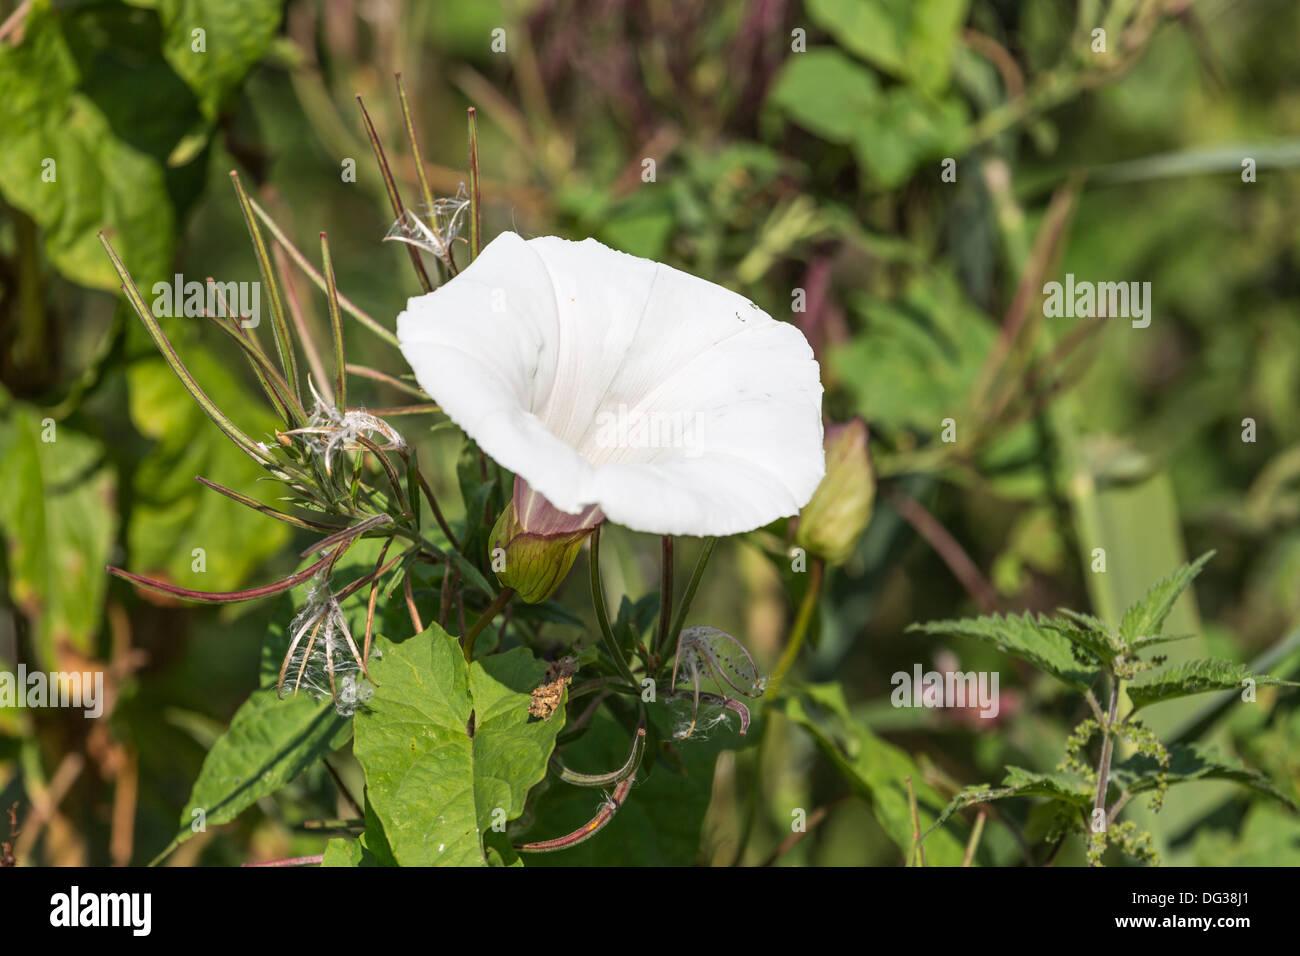 Bindweed convolvulus arvensis a common white flowering weed stock bindweed convolvulus arvensis a common white flowering weed mightylinksfo